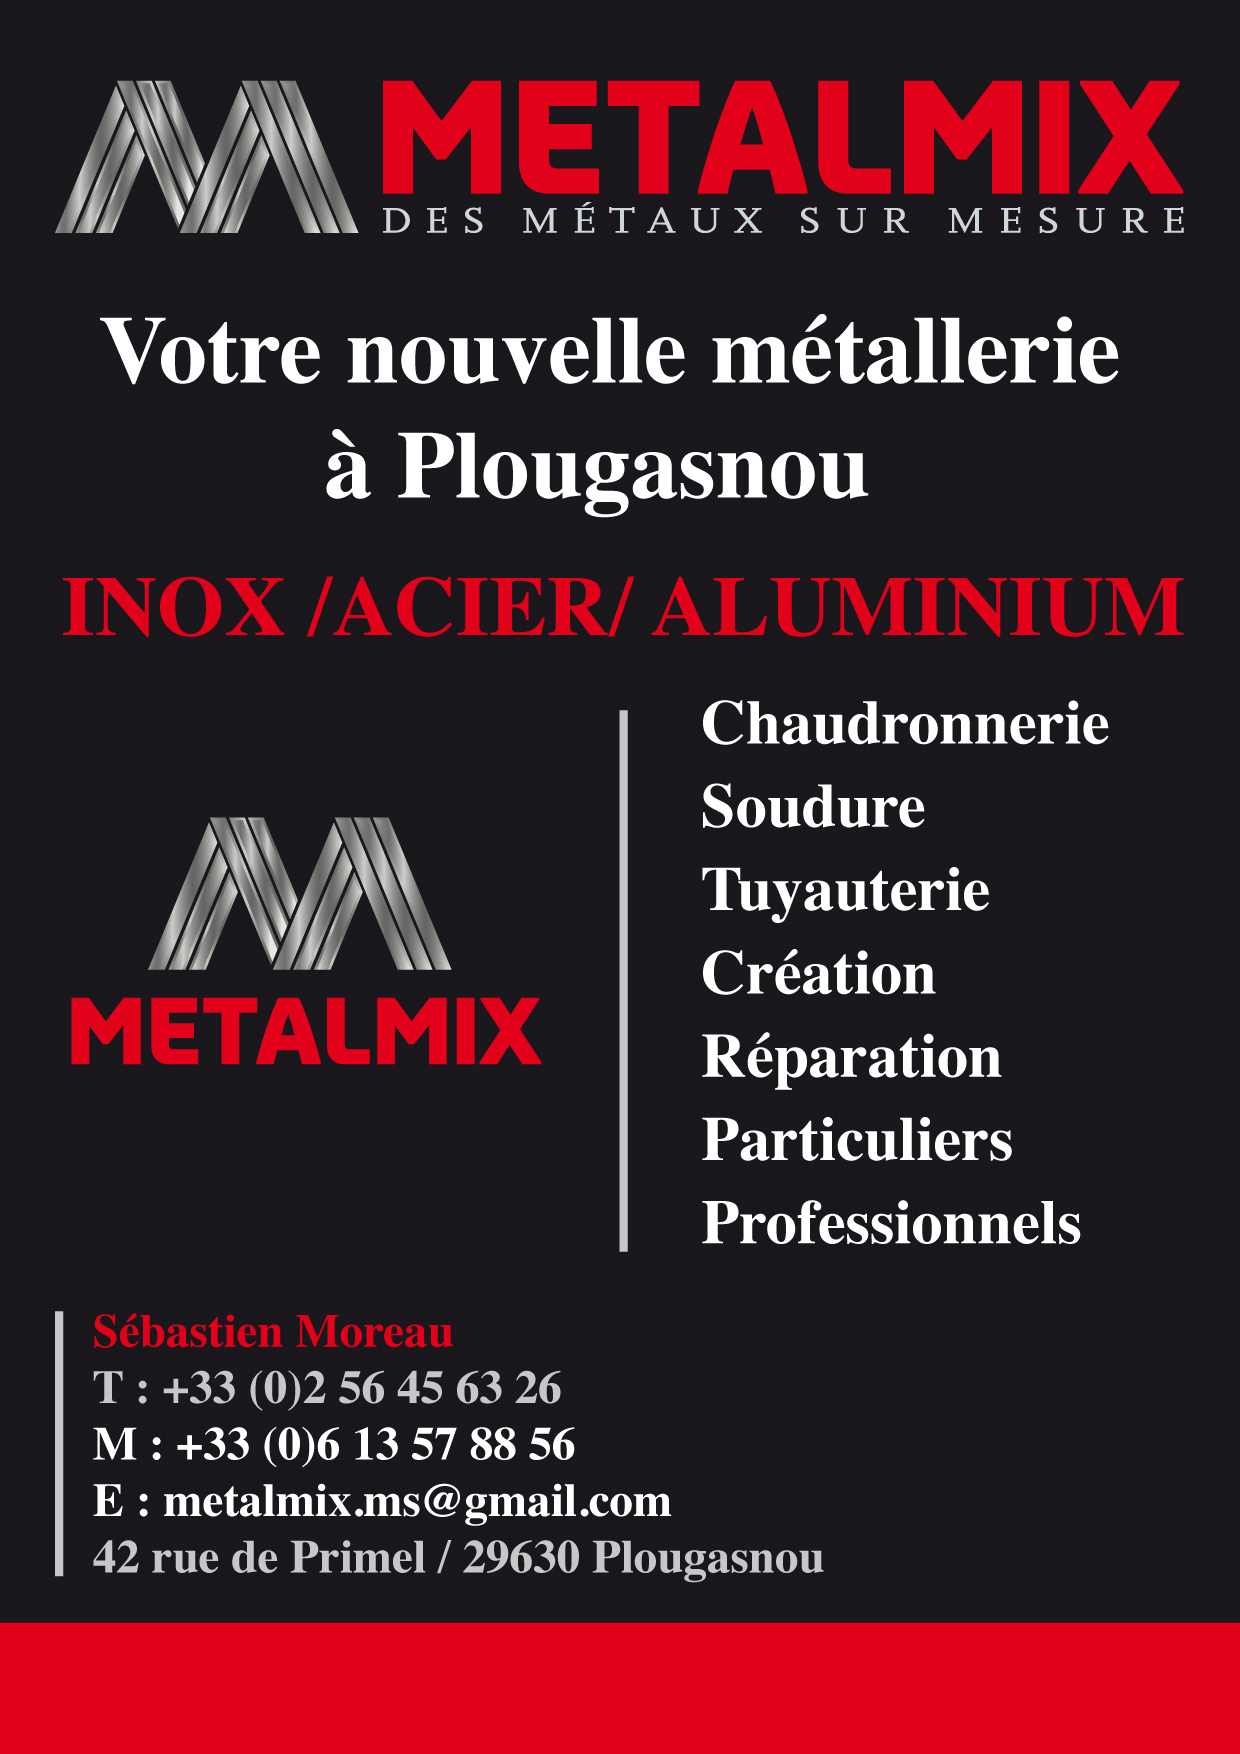 Metalmix Chaudronnerie Metallerie Inox Acier Alu Plougasnou Morlaix